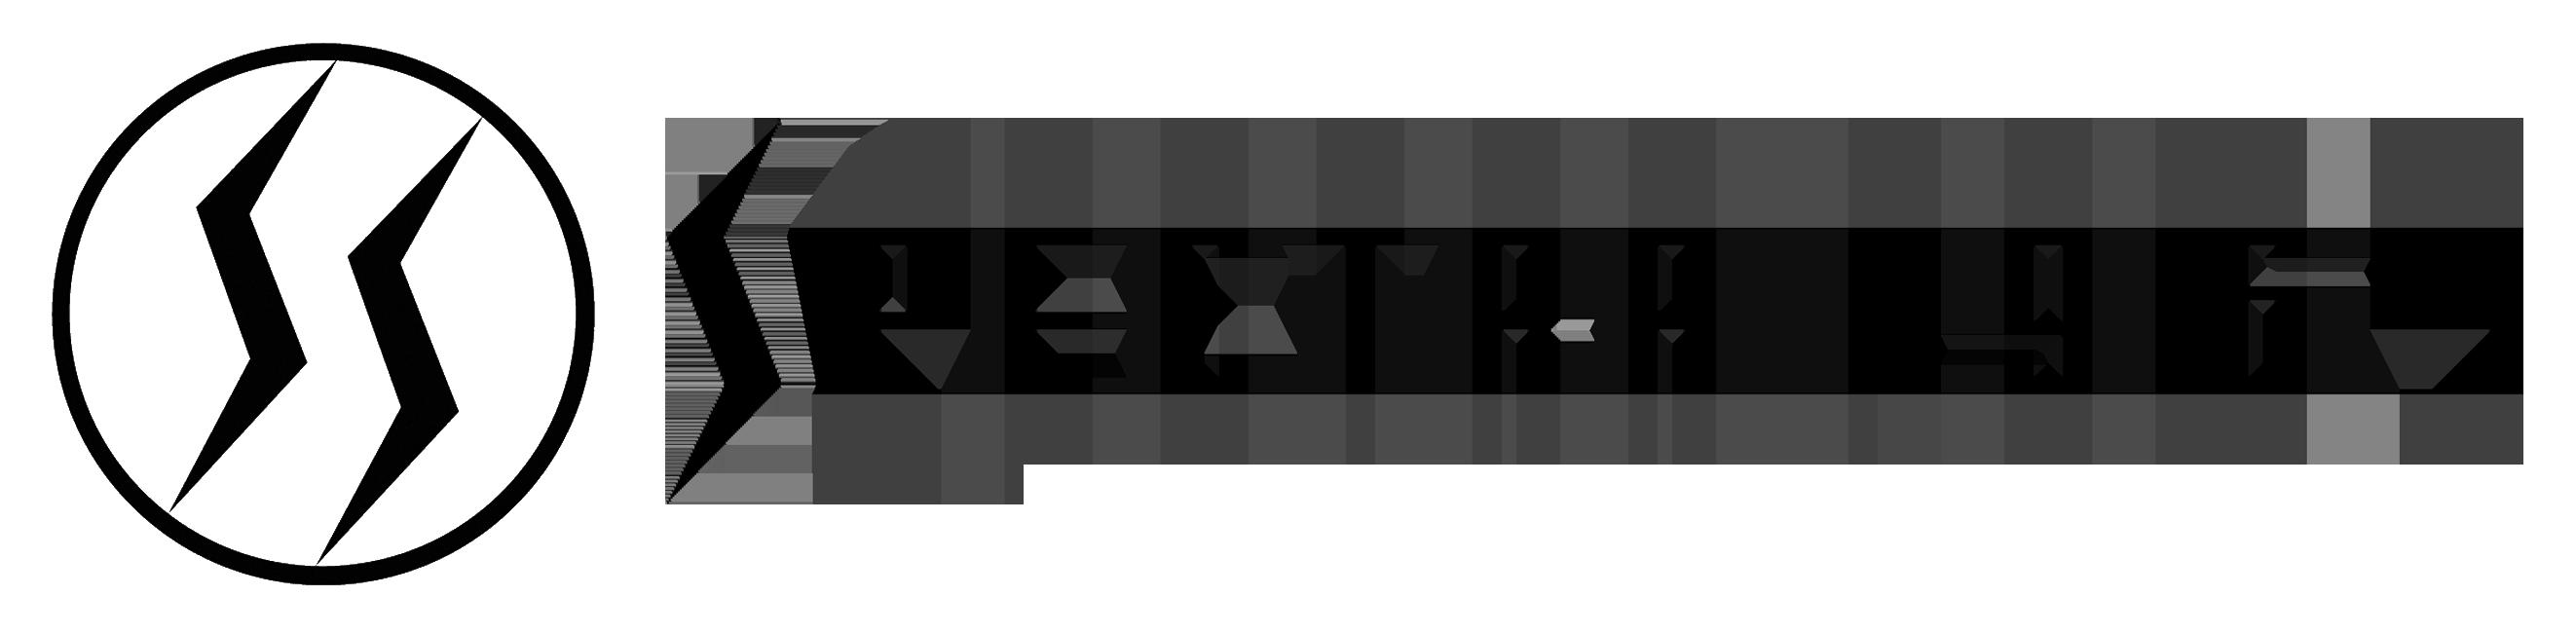 Spectra 1964 logo